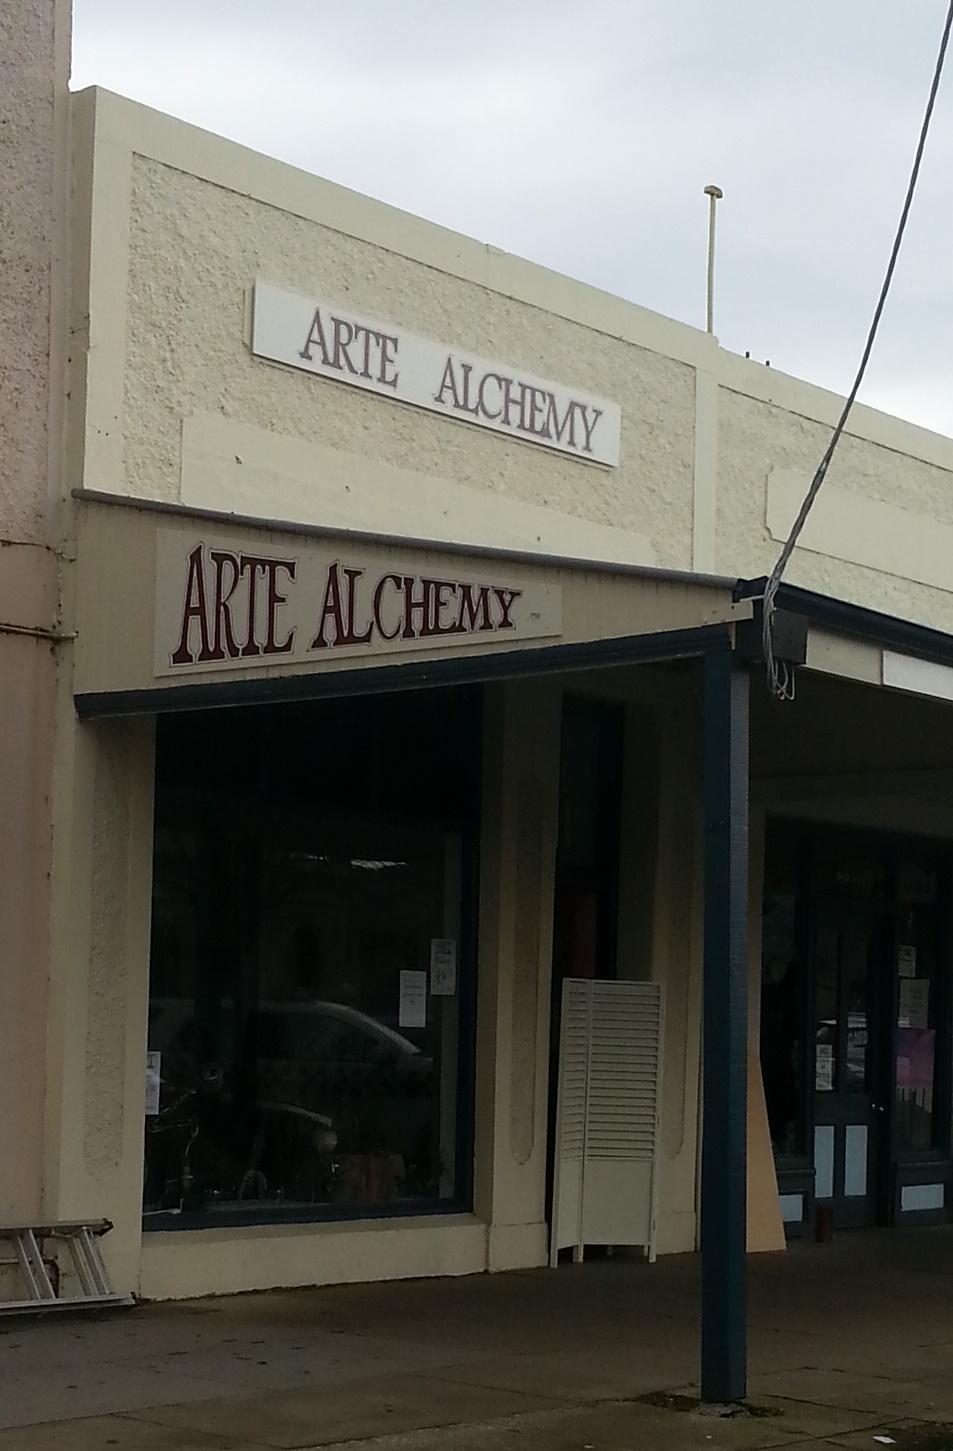 Arte Alchemy   art gallery   91 Ford St, Beechworth VIC 3749, Australia   0357283071 OR +61 3 5728 3071